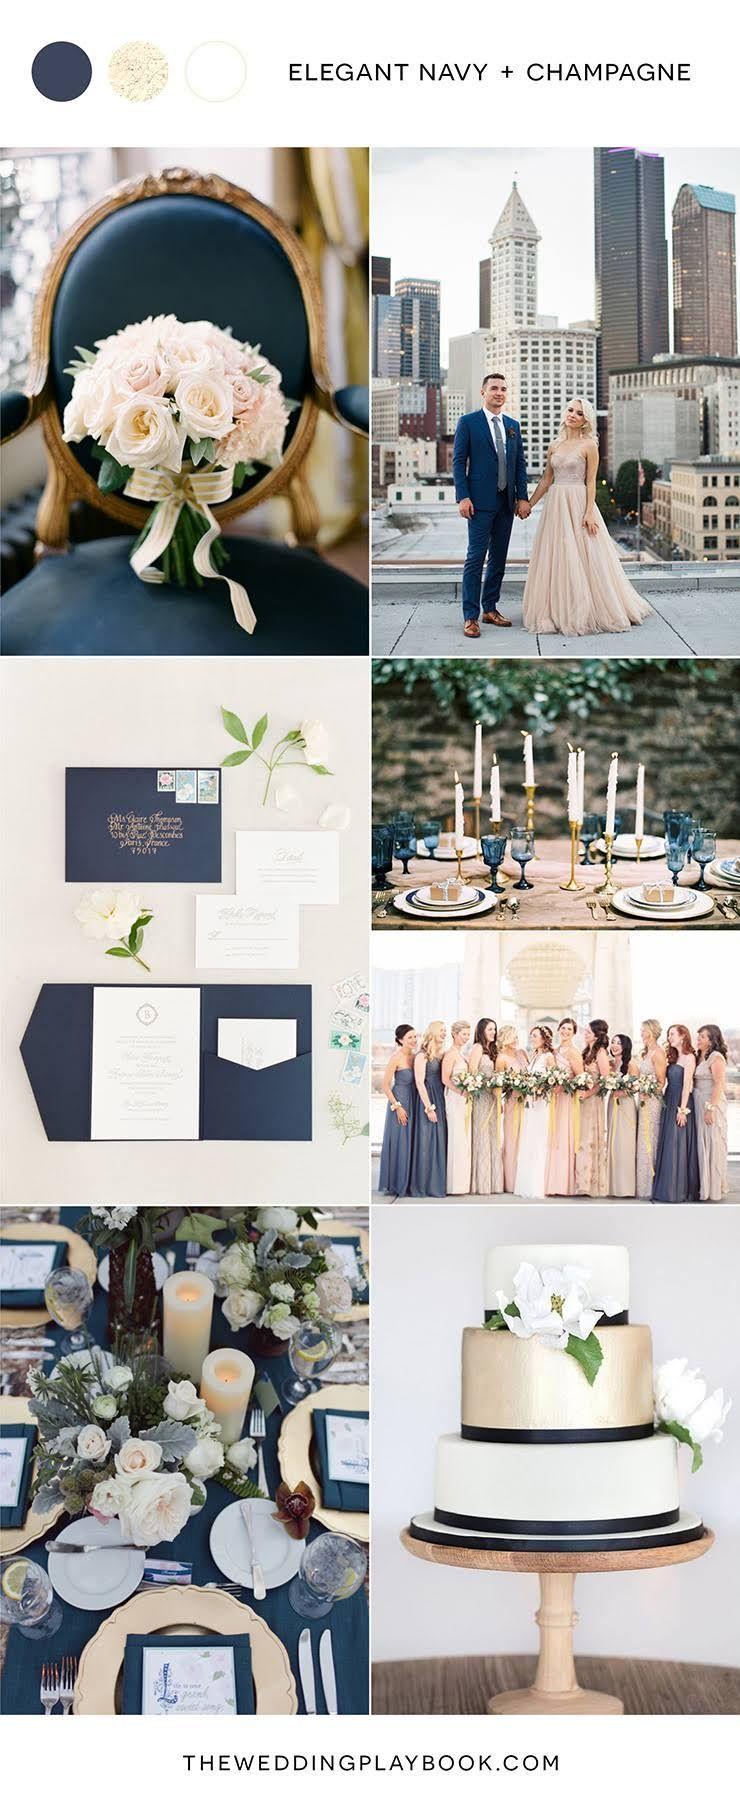 Repurpose wedding dress  Elegant navy and champagne wedding inspiration  Cakes  Pinterest